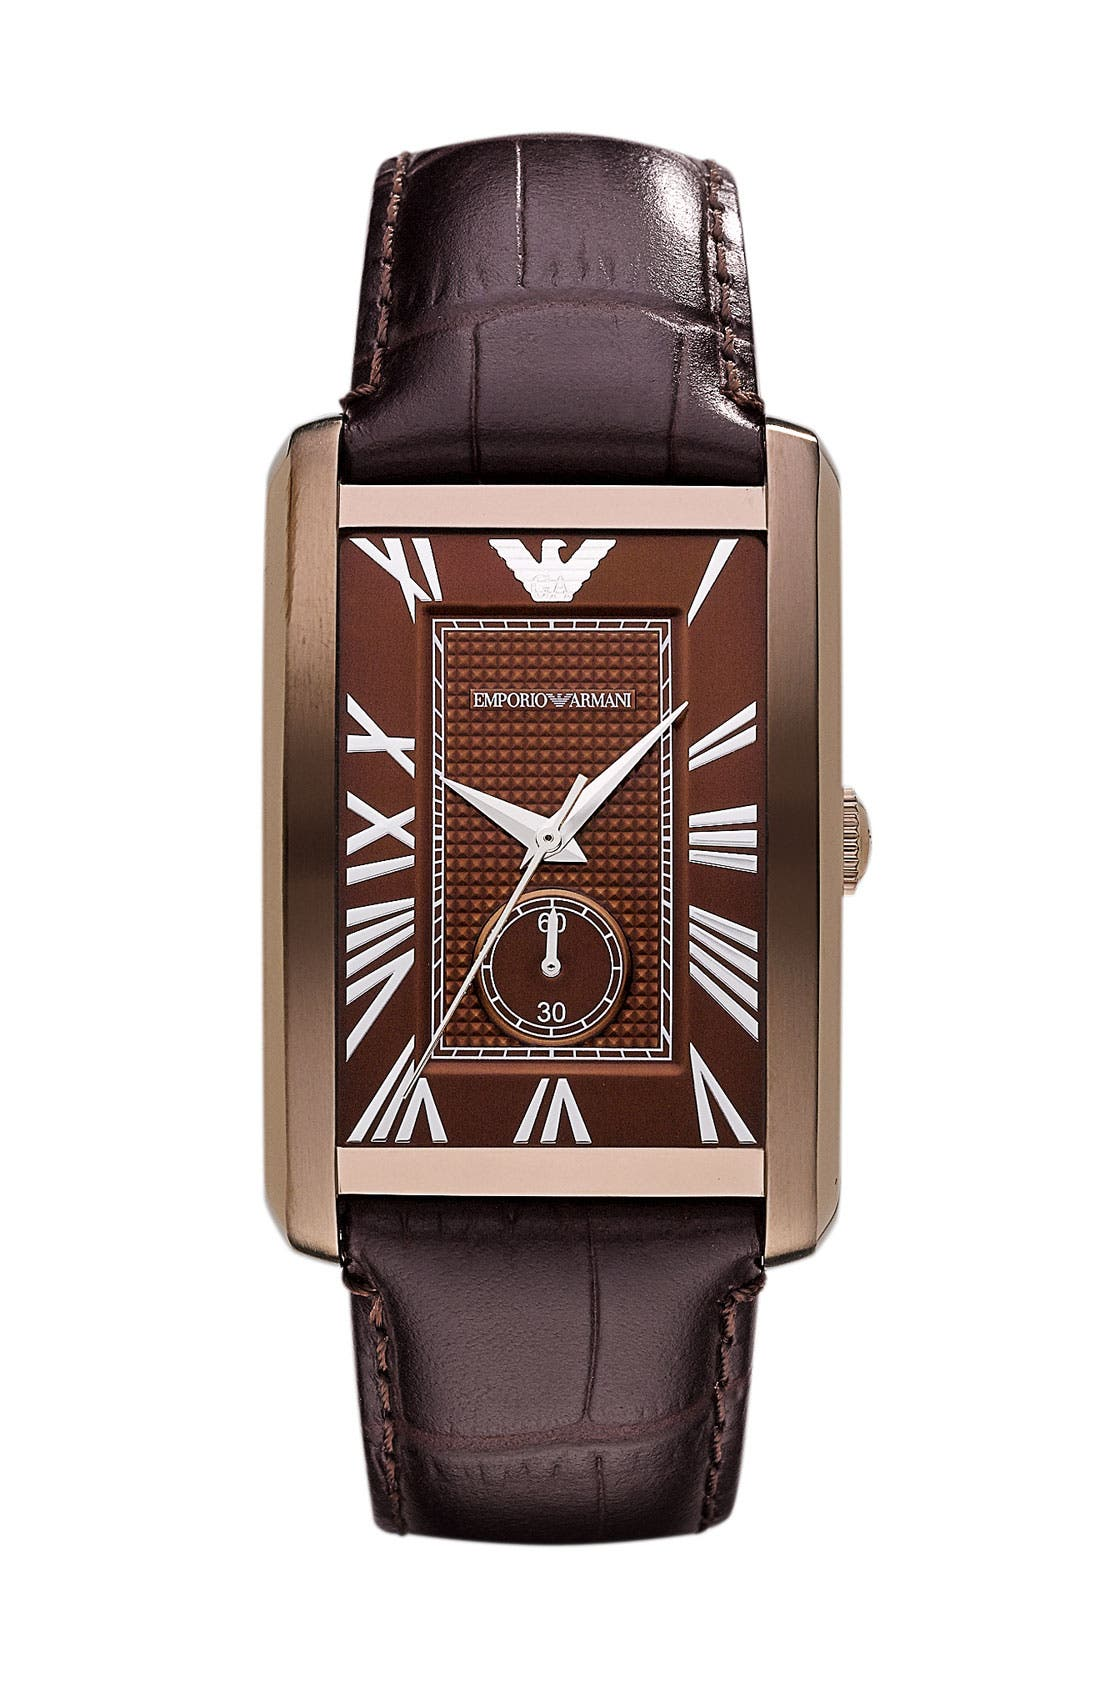 Main Image - Emporio Armani 'Classic - Large' Rectangular Dial Watch